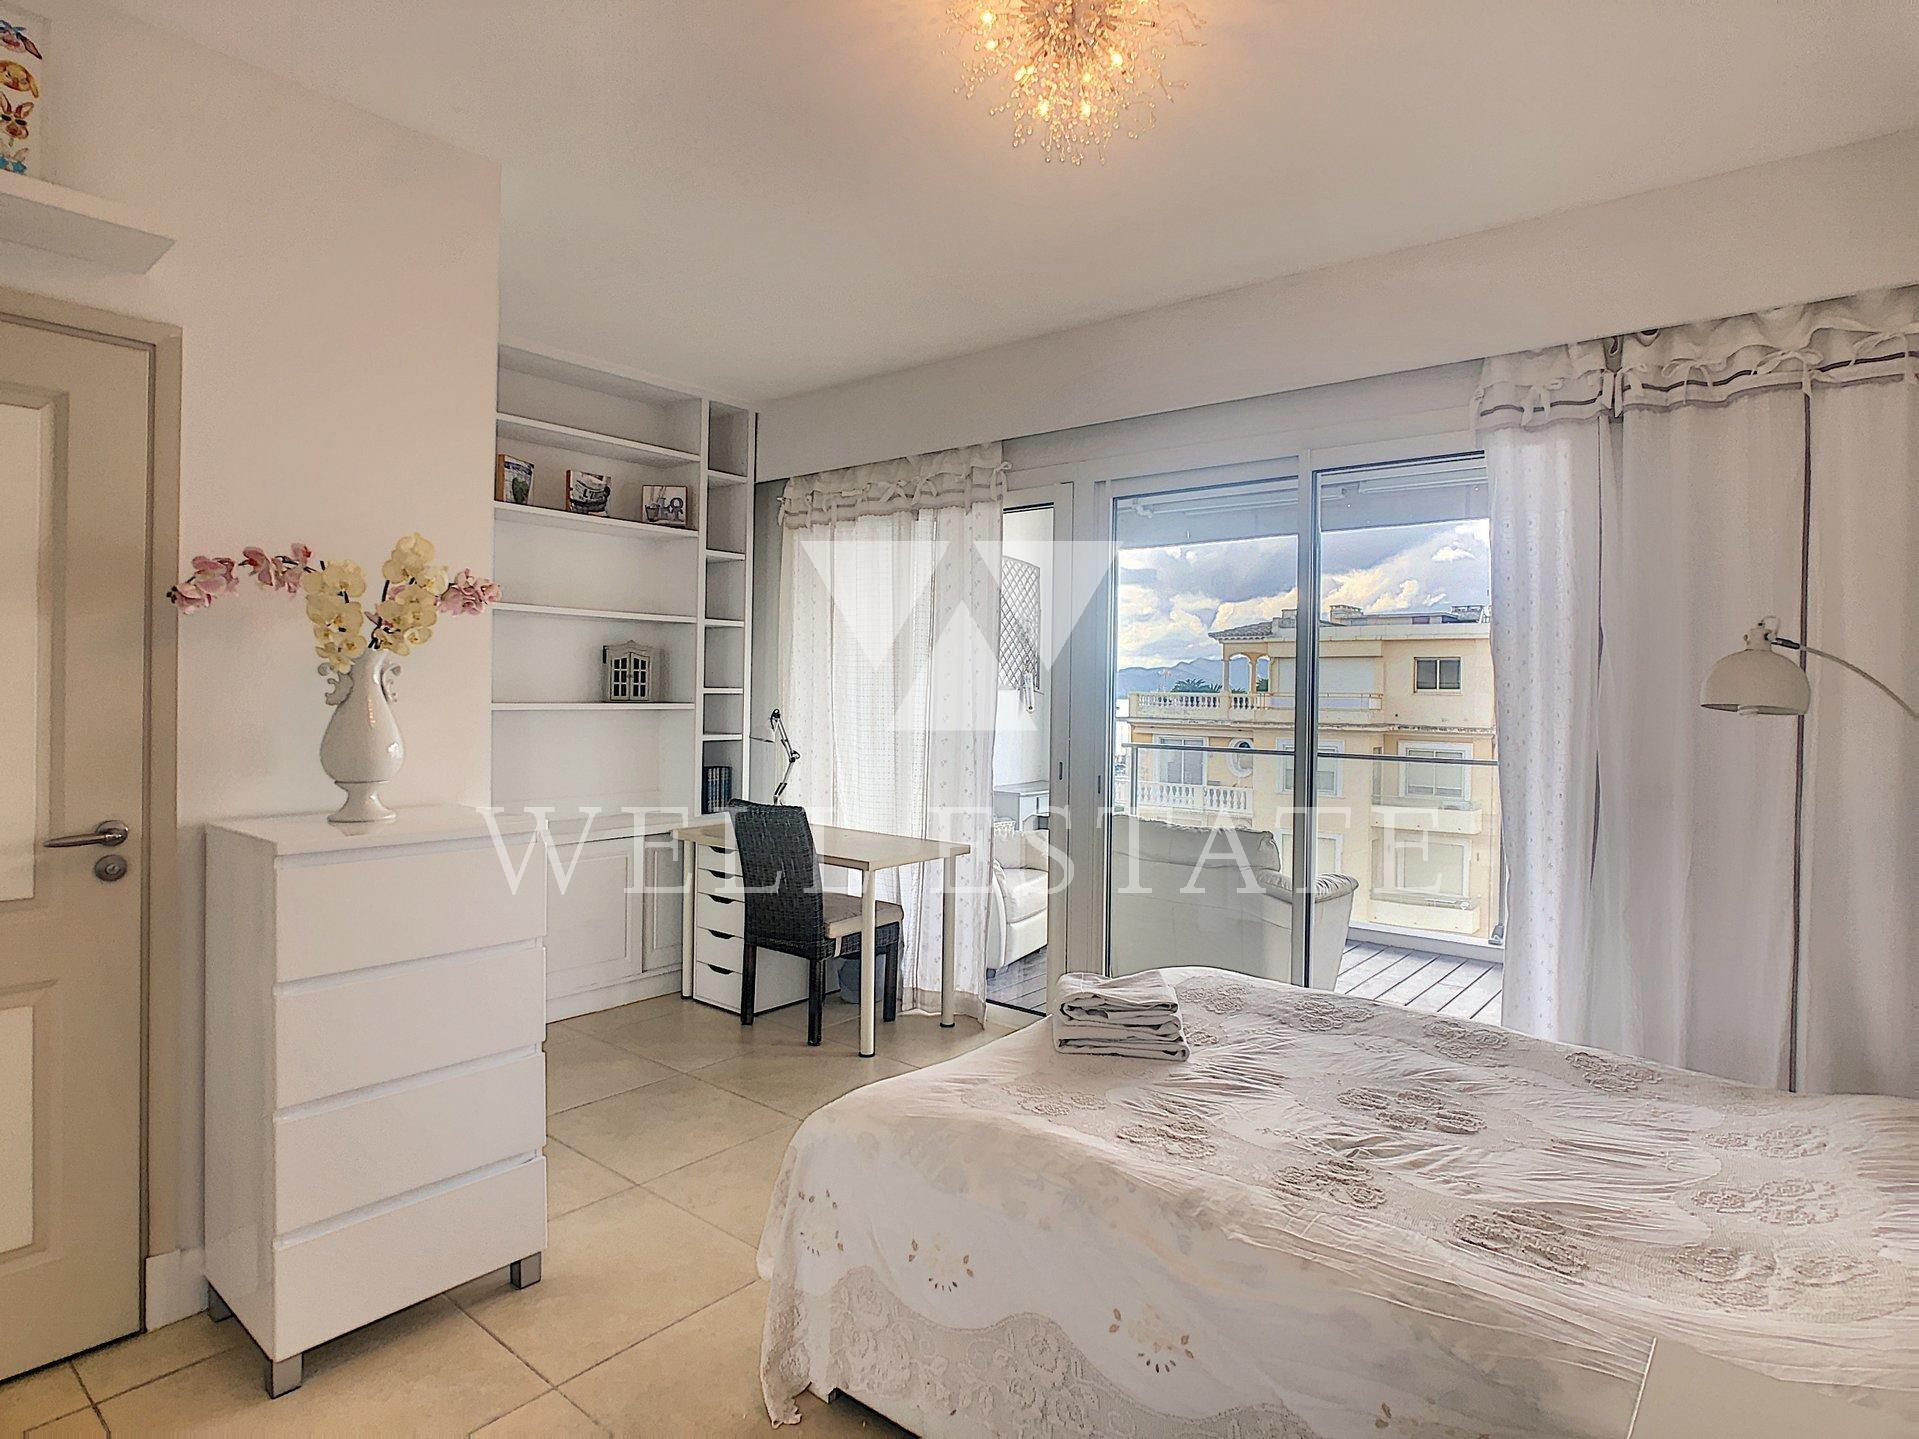 季节性出租 公寓 - 戛納 (Cannes) Pointe Croisette